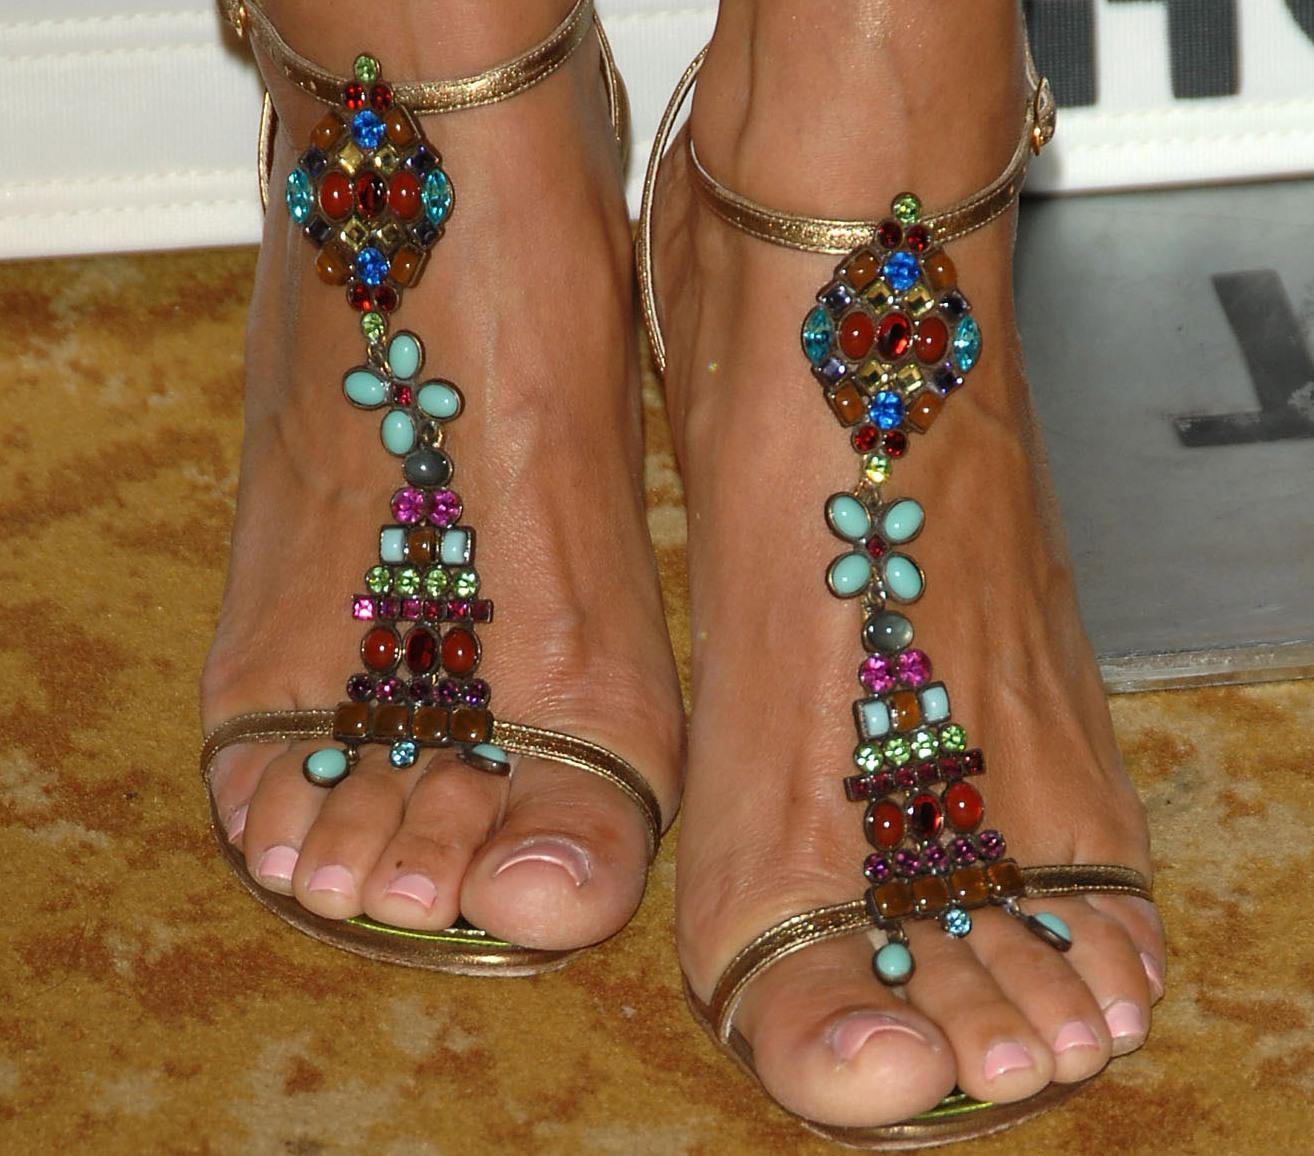 http://2.bp.blogspot.com/_UaLWp72nij4/S_g_Cna1iQI/AAAAAAAAMVs/2EfohL16YU4/s1600/lori-loughlin-feet.jpg